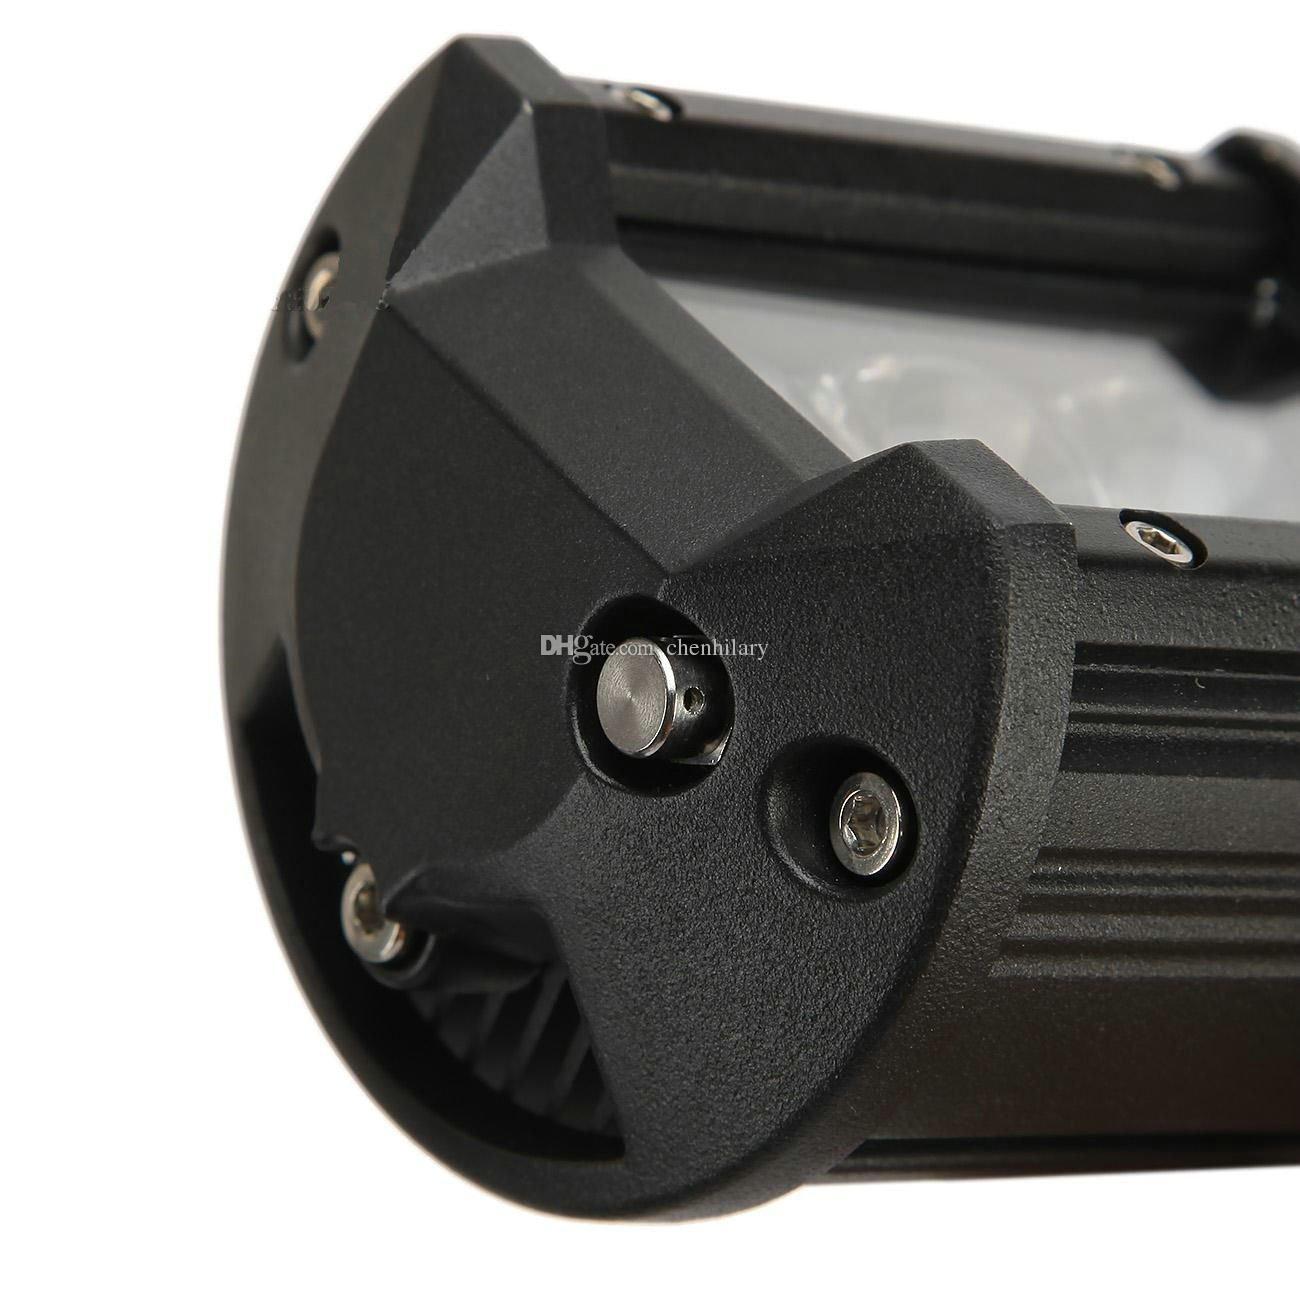 4inch Osram 30W LED Light Bar ATV Waterproof IP67 12V 24V Car 4X4 4WD Truck SUV Jeep Flood Spot 6X5W LED Offroad Fog Driving Light